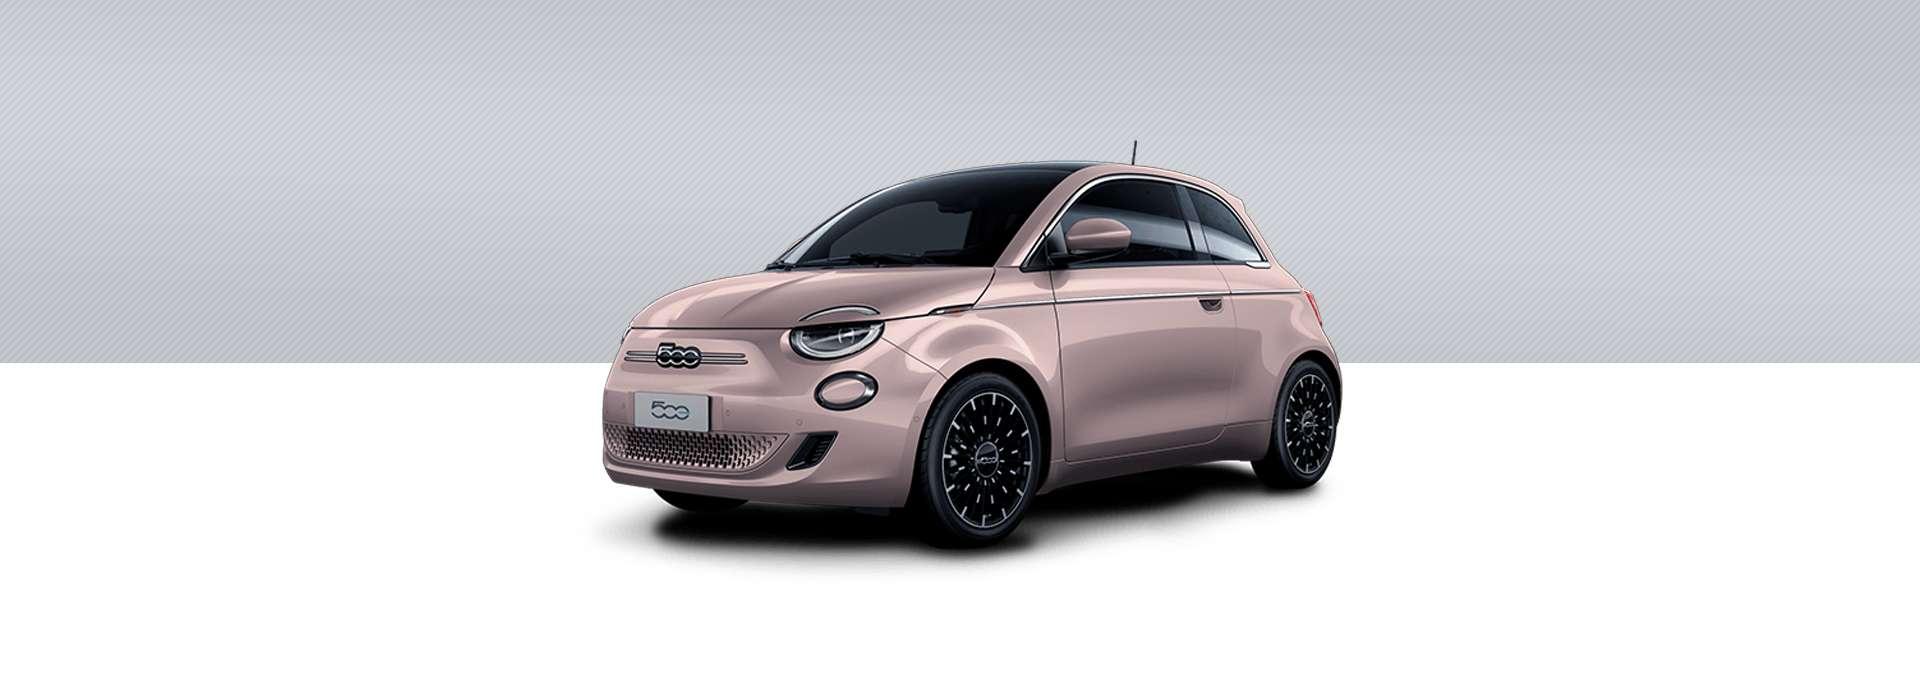 Fiat NUEVO 500 3+1